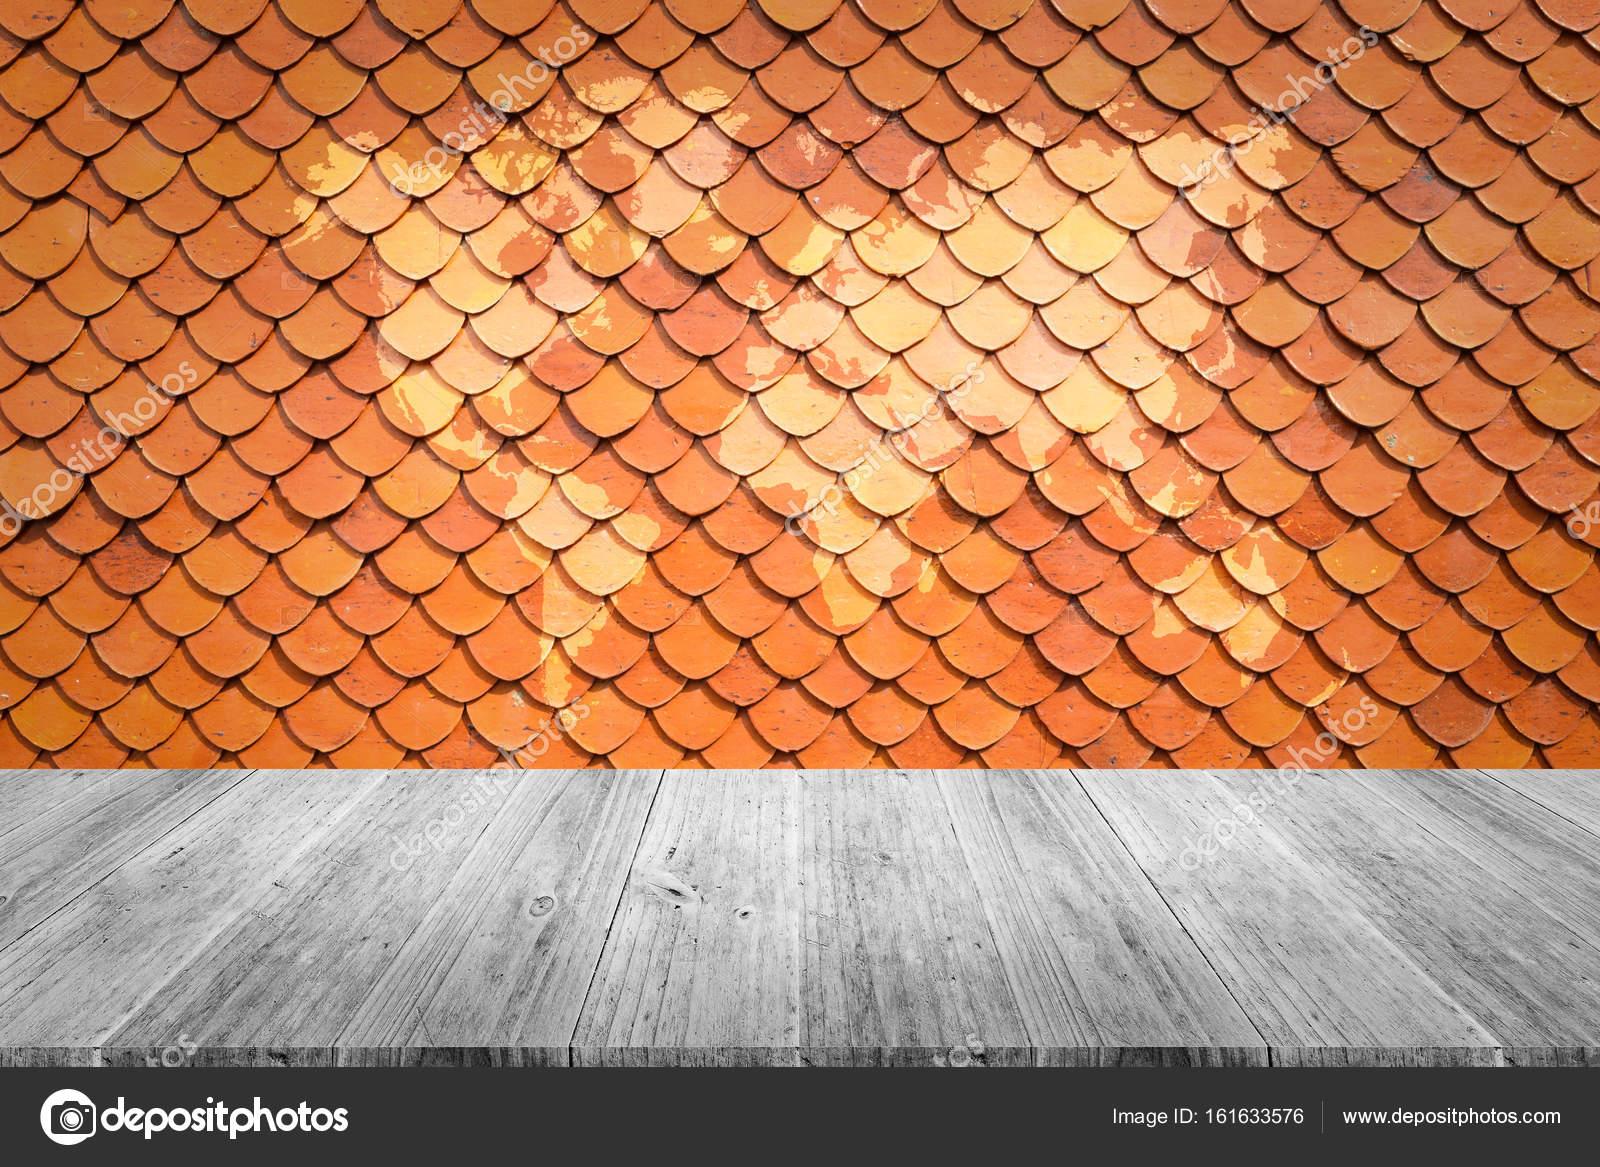 Textura De Techo De Teja Foto De Stock Pongmoji 161633576